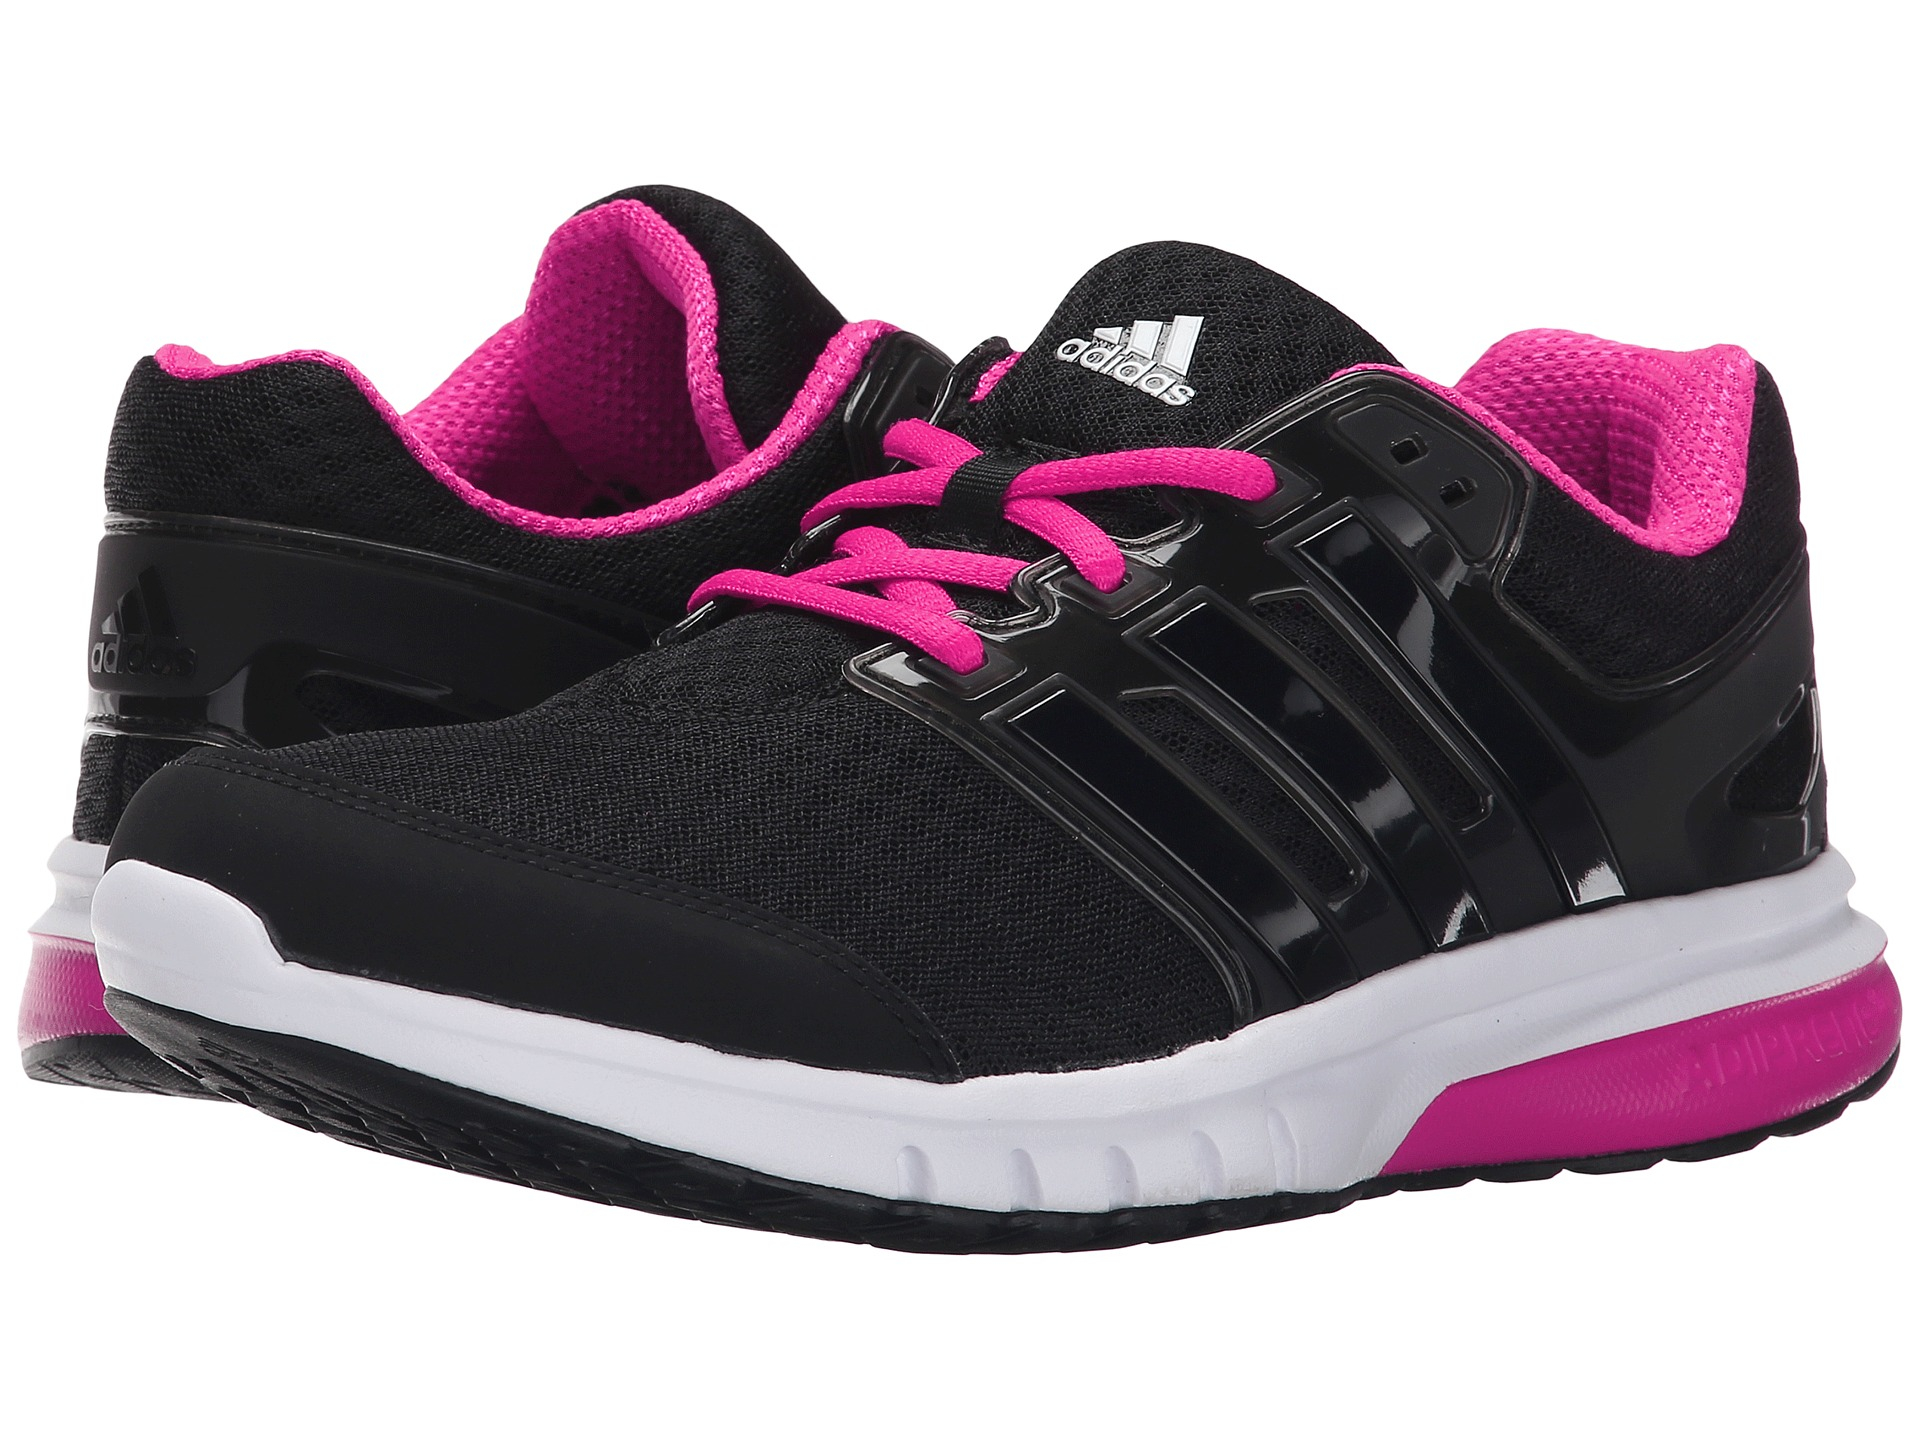 01986d28d4d9 Lyst - adidas Originals Galaxy Elite 2 W in Pink